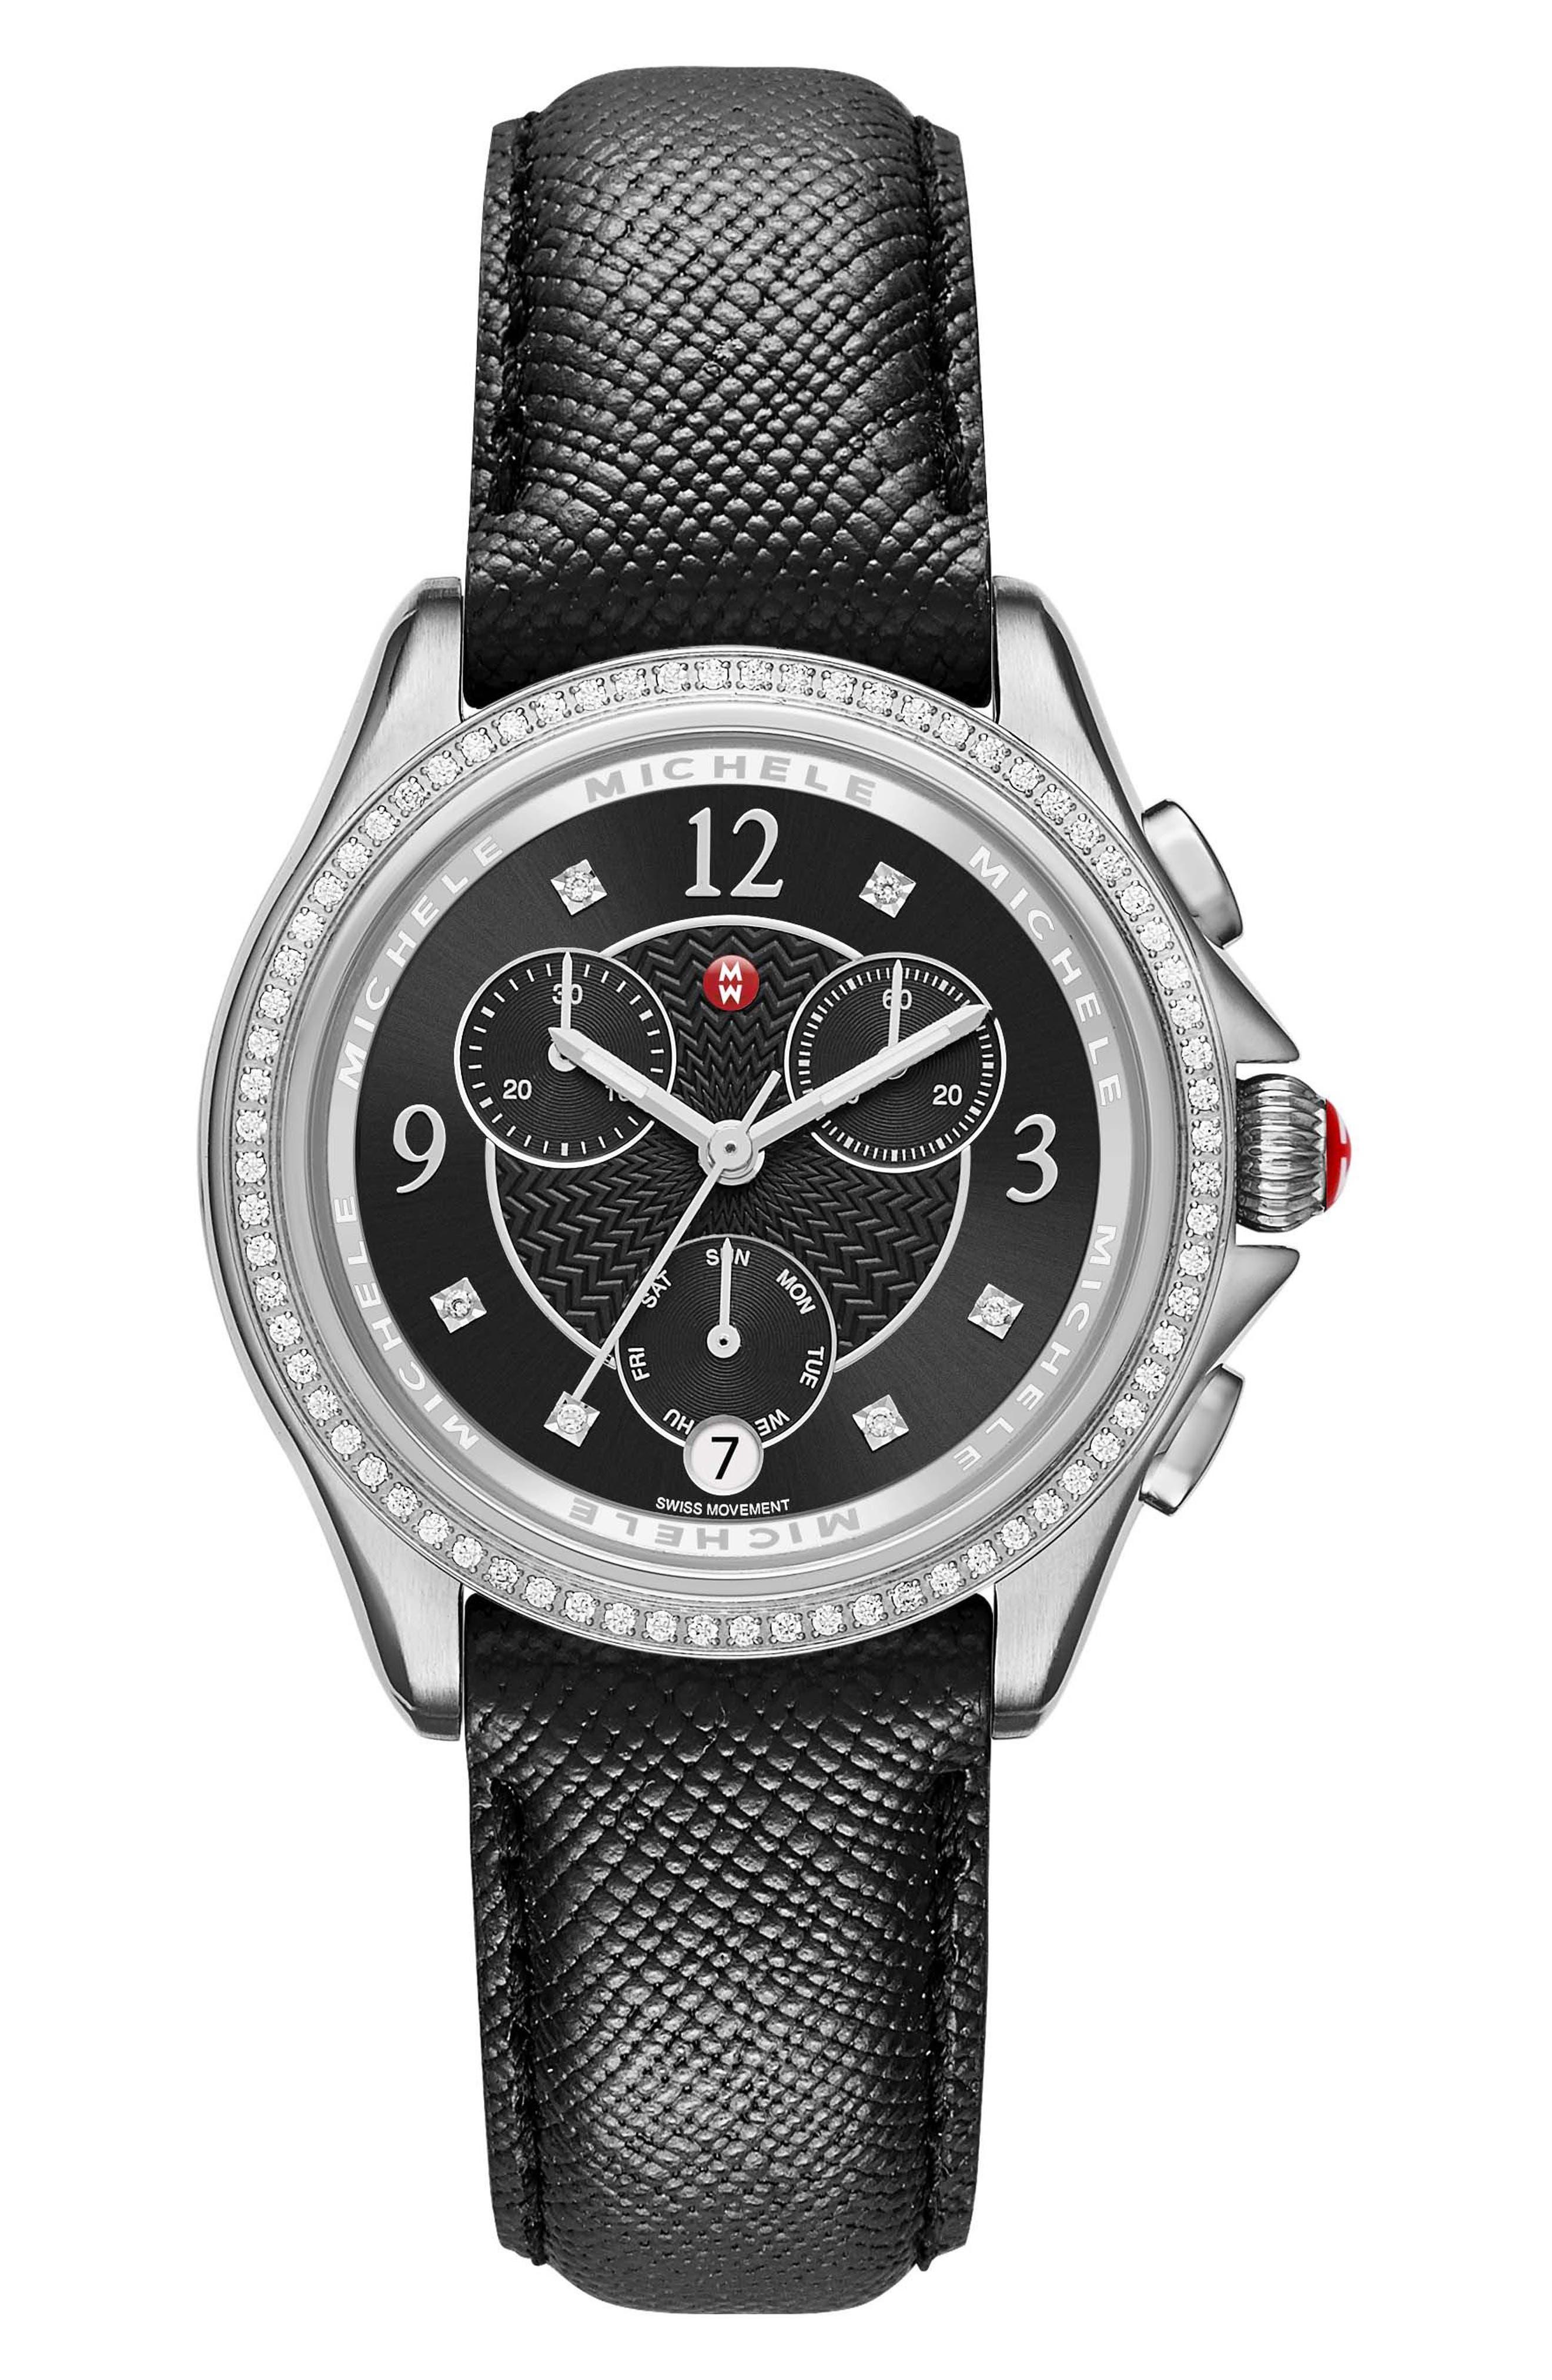 MICHELE Belmore Diamond Chronograph Leather Strap Watch, 37mm